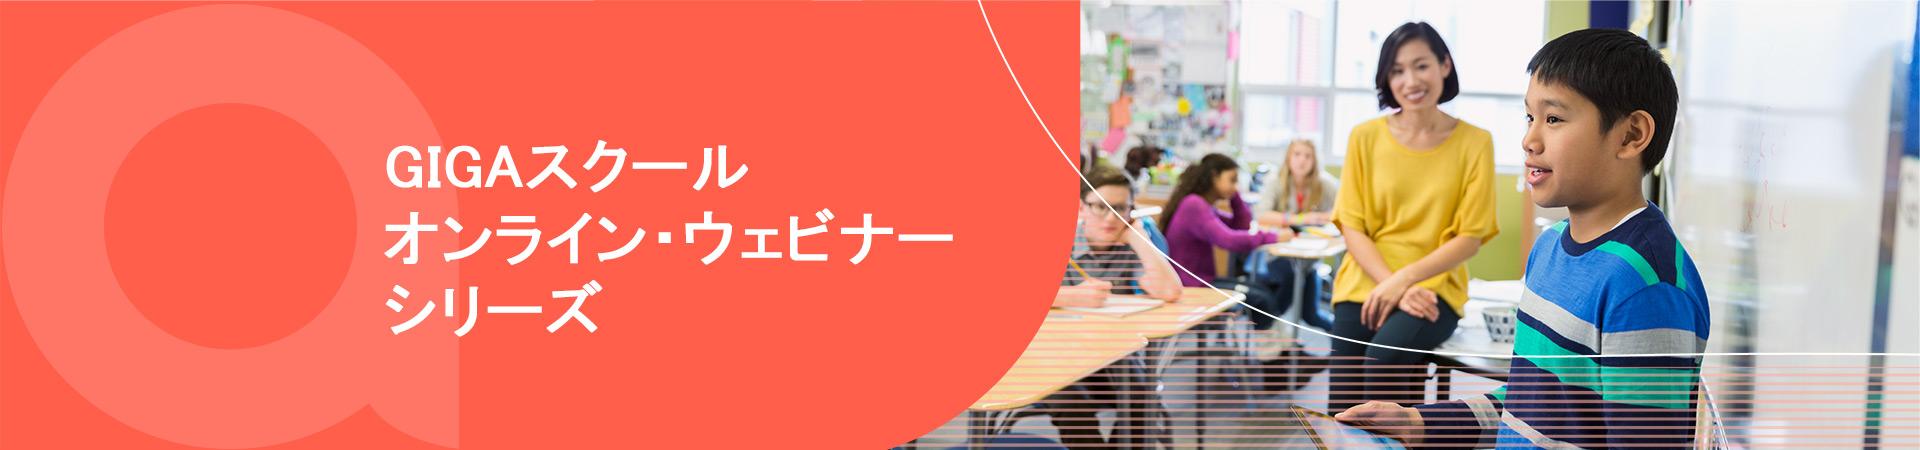 GIGAスクールウェビナーシリーズ ビデオオンデマンド